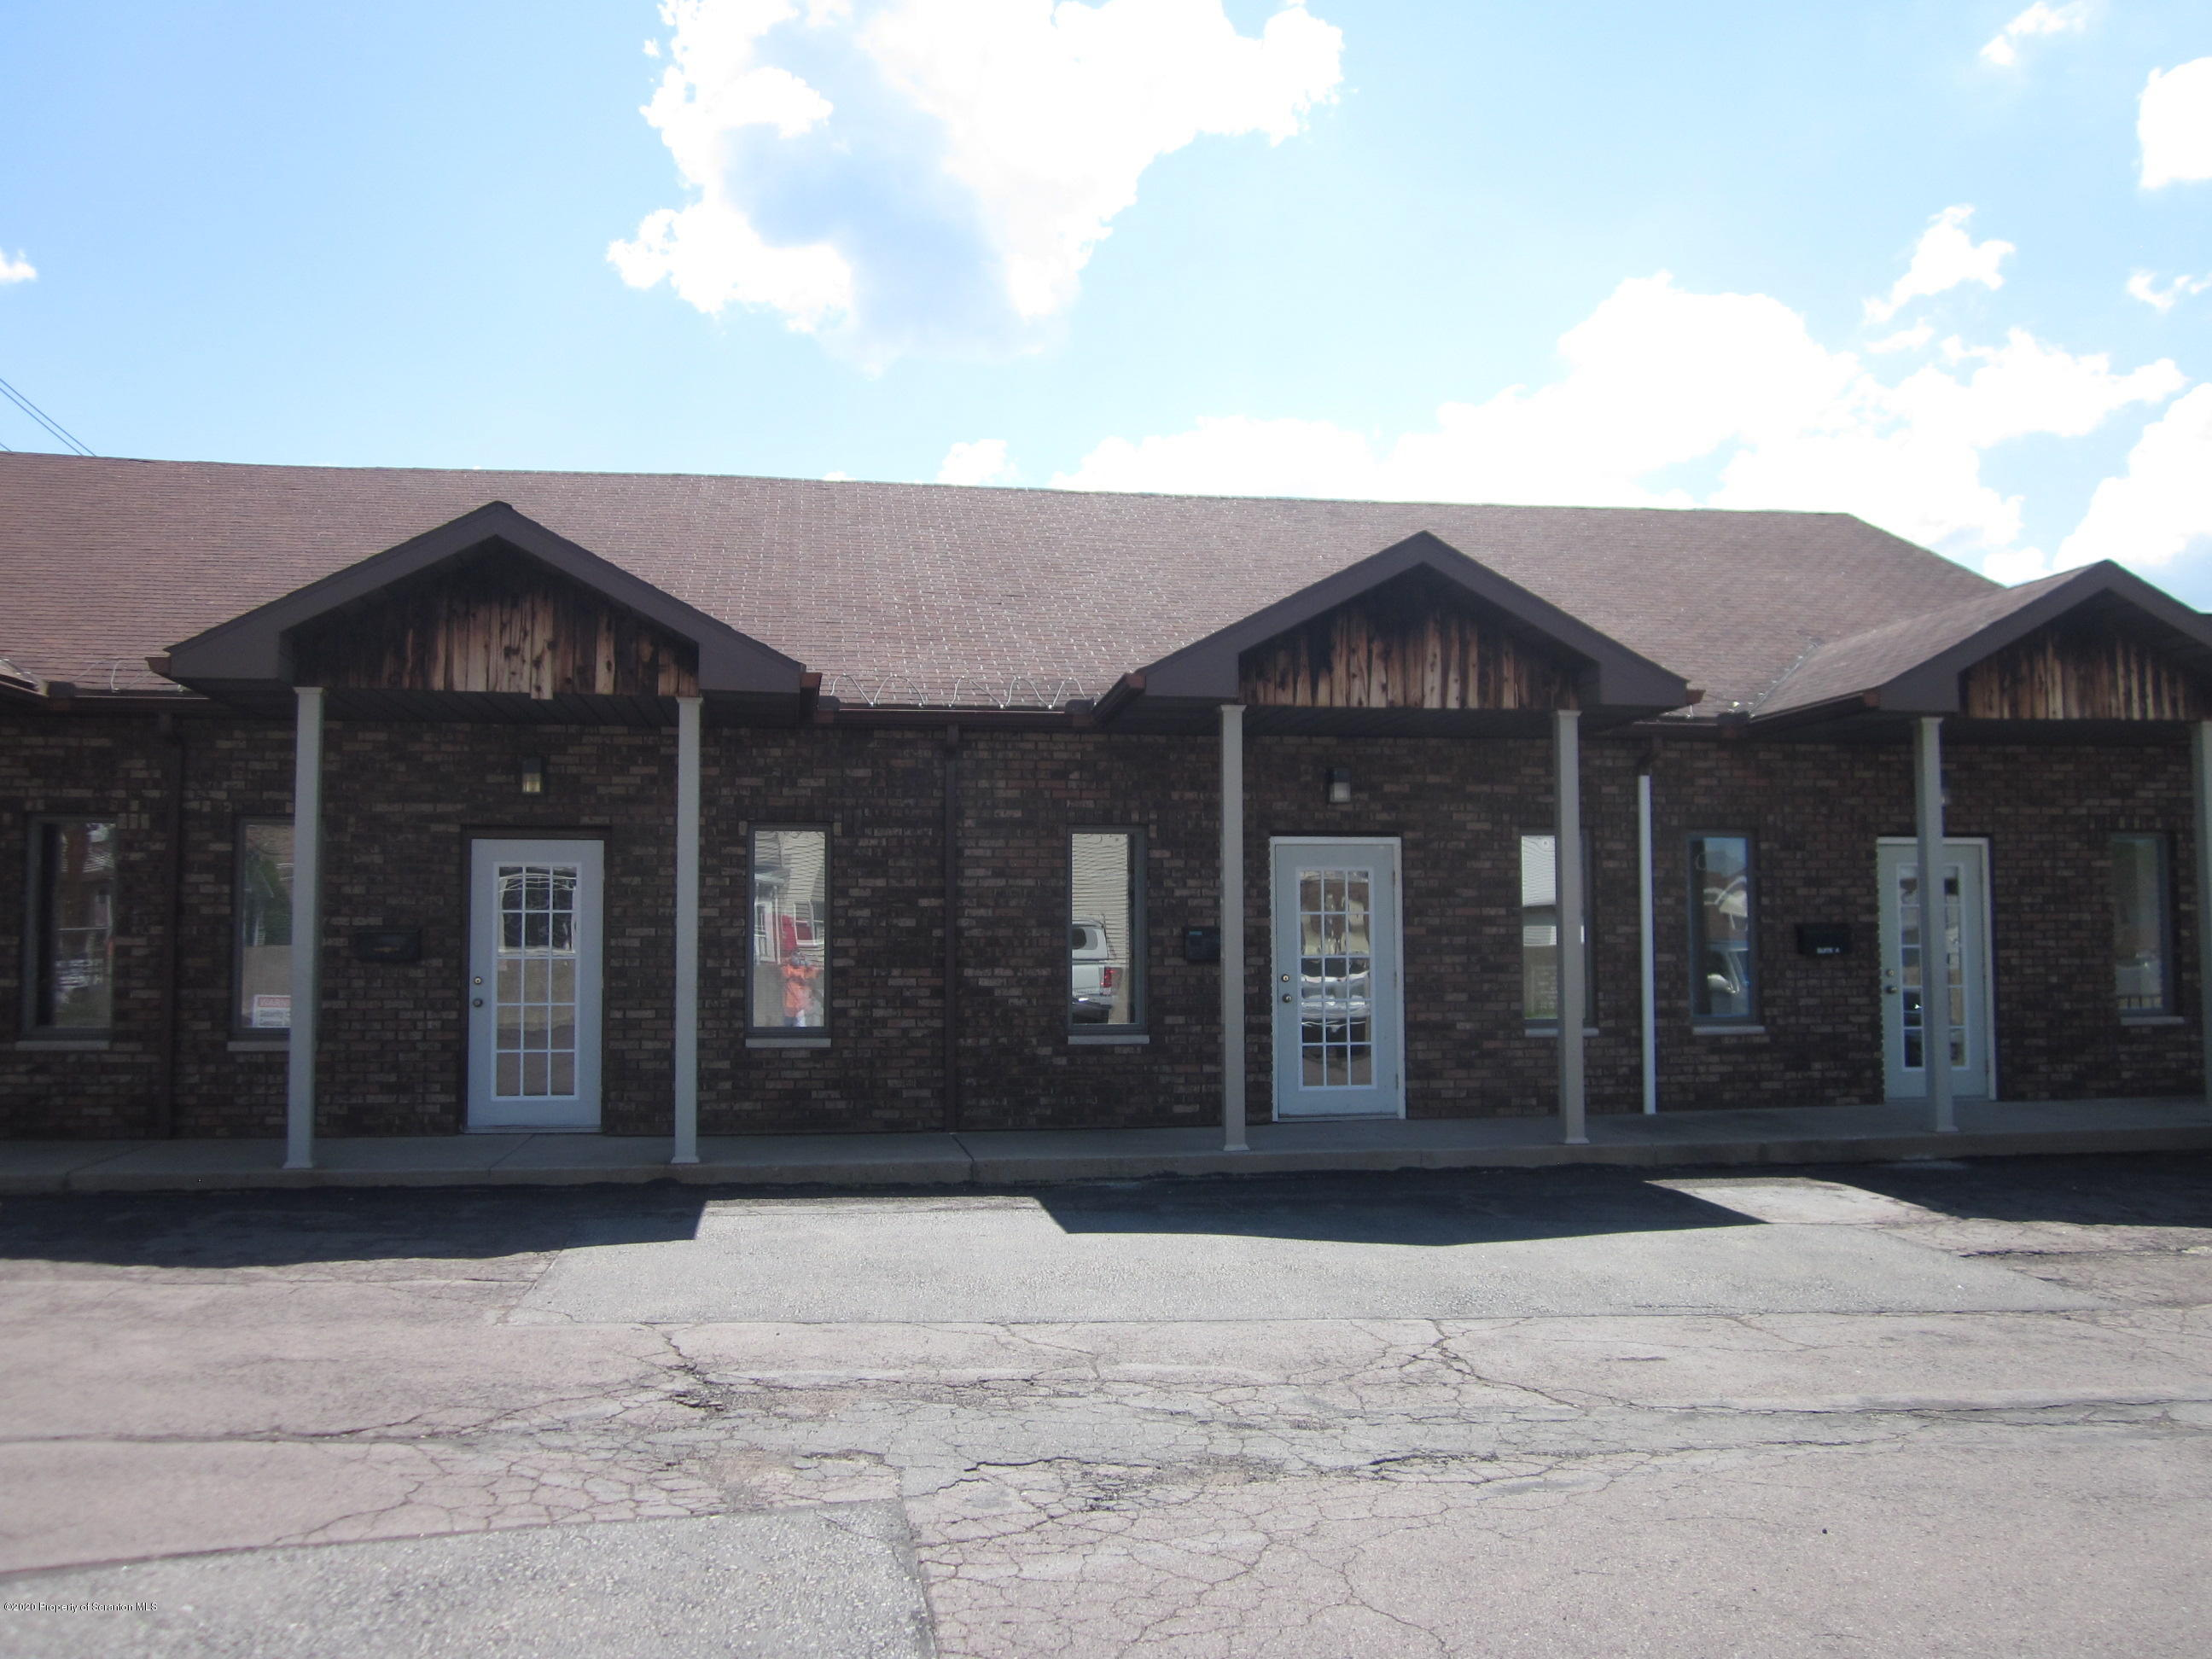 1005 Main St, Peckville, Pennsylvania 18452, ,1 BathroomBathrooms,Commercial,For Lease,Main,21-4338